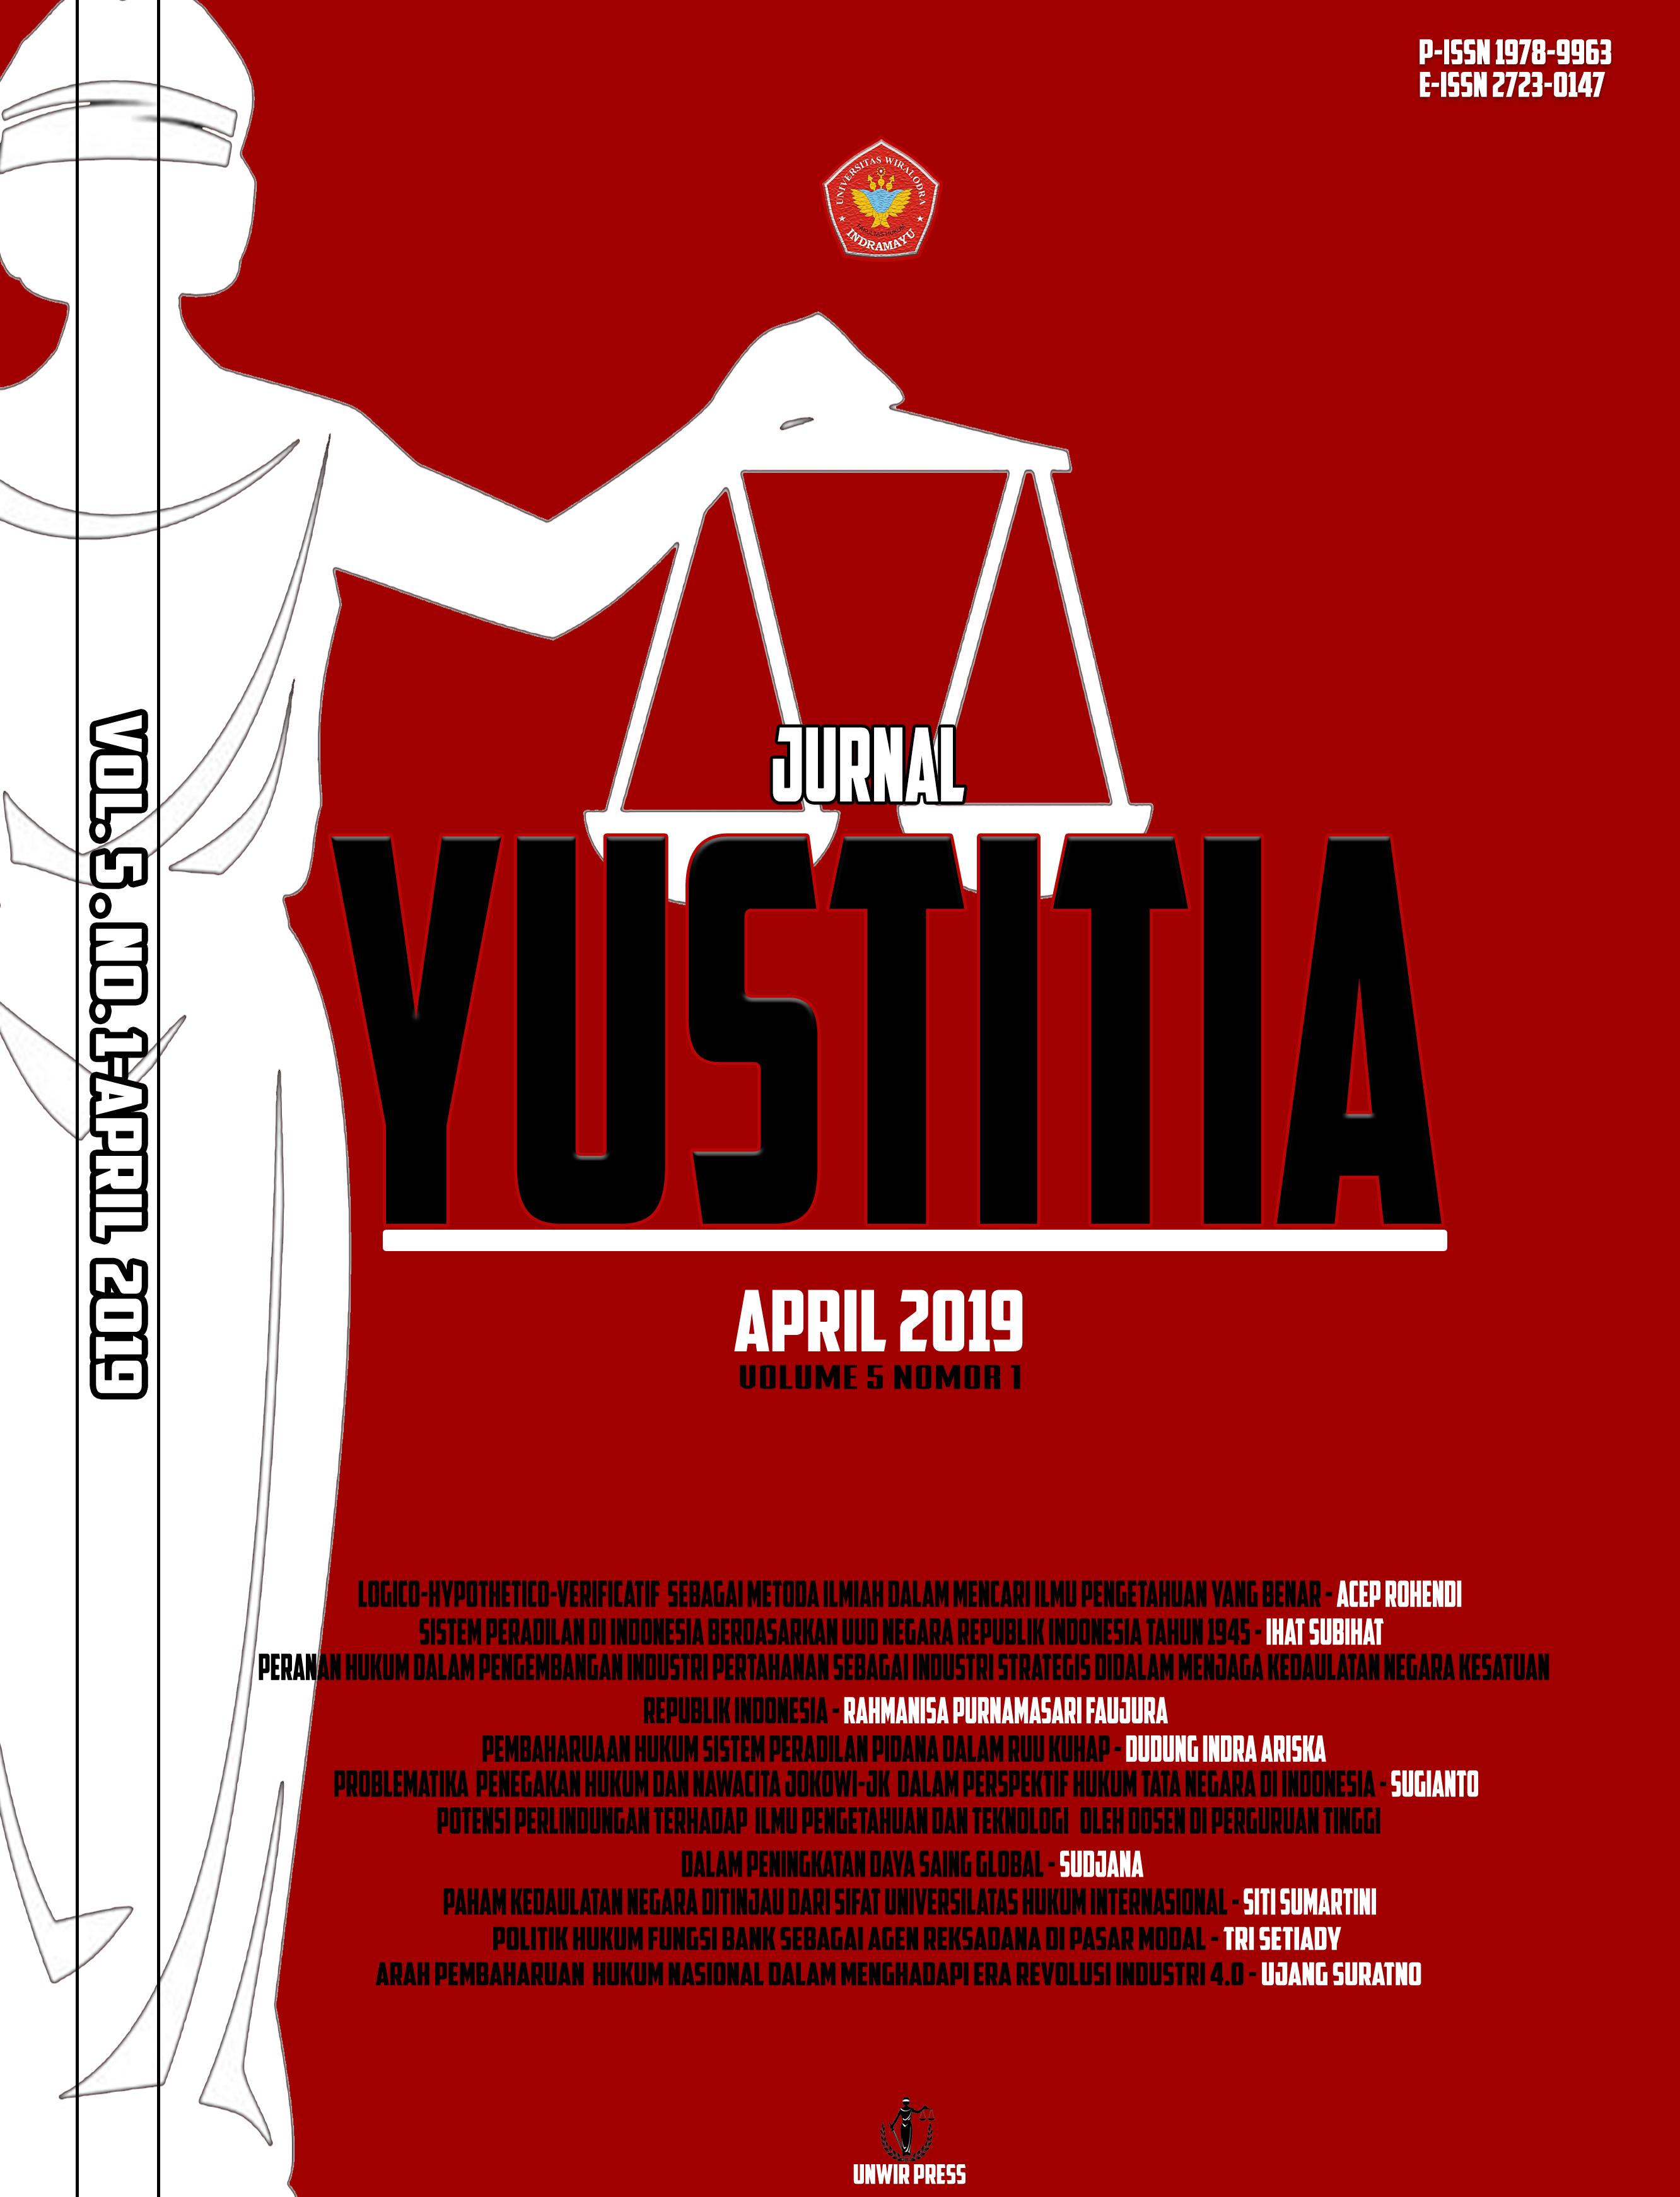 JURNAL YUSTITIA FAKULTAS HUKUM UNWIR